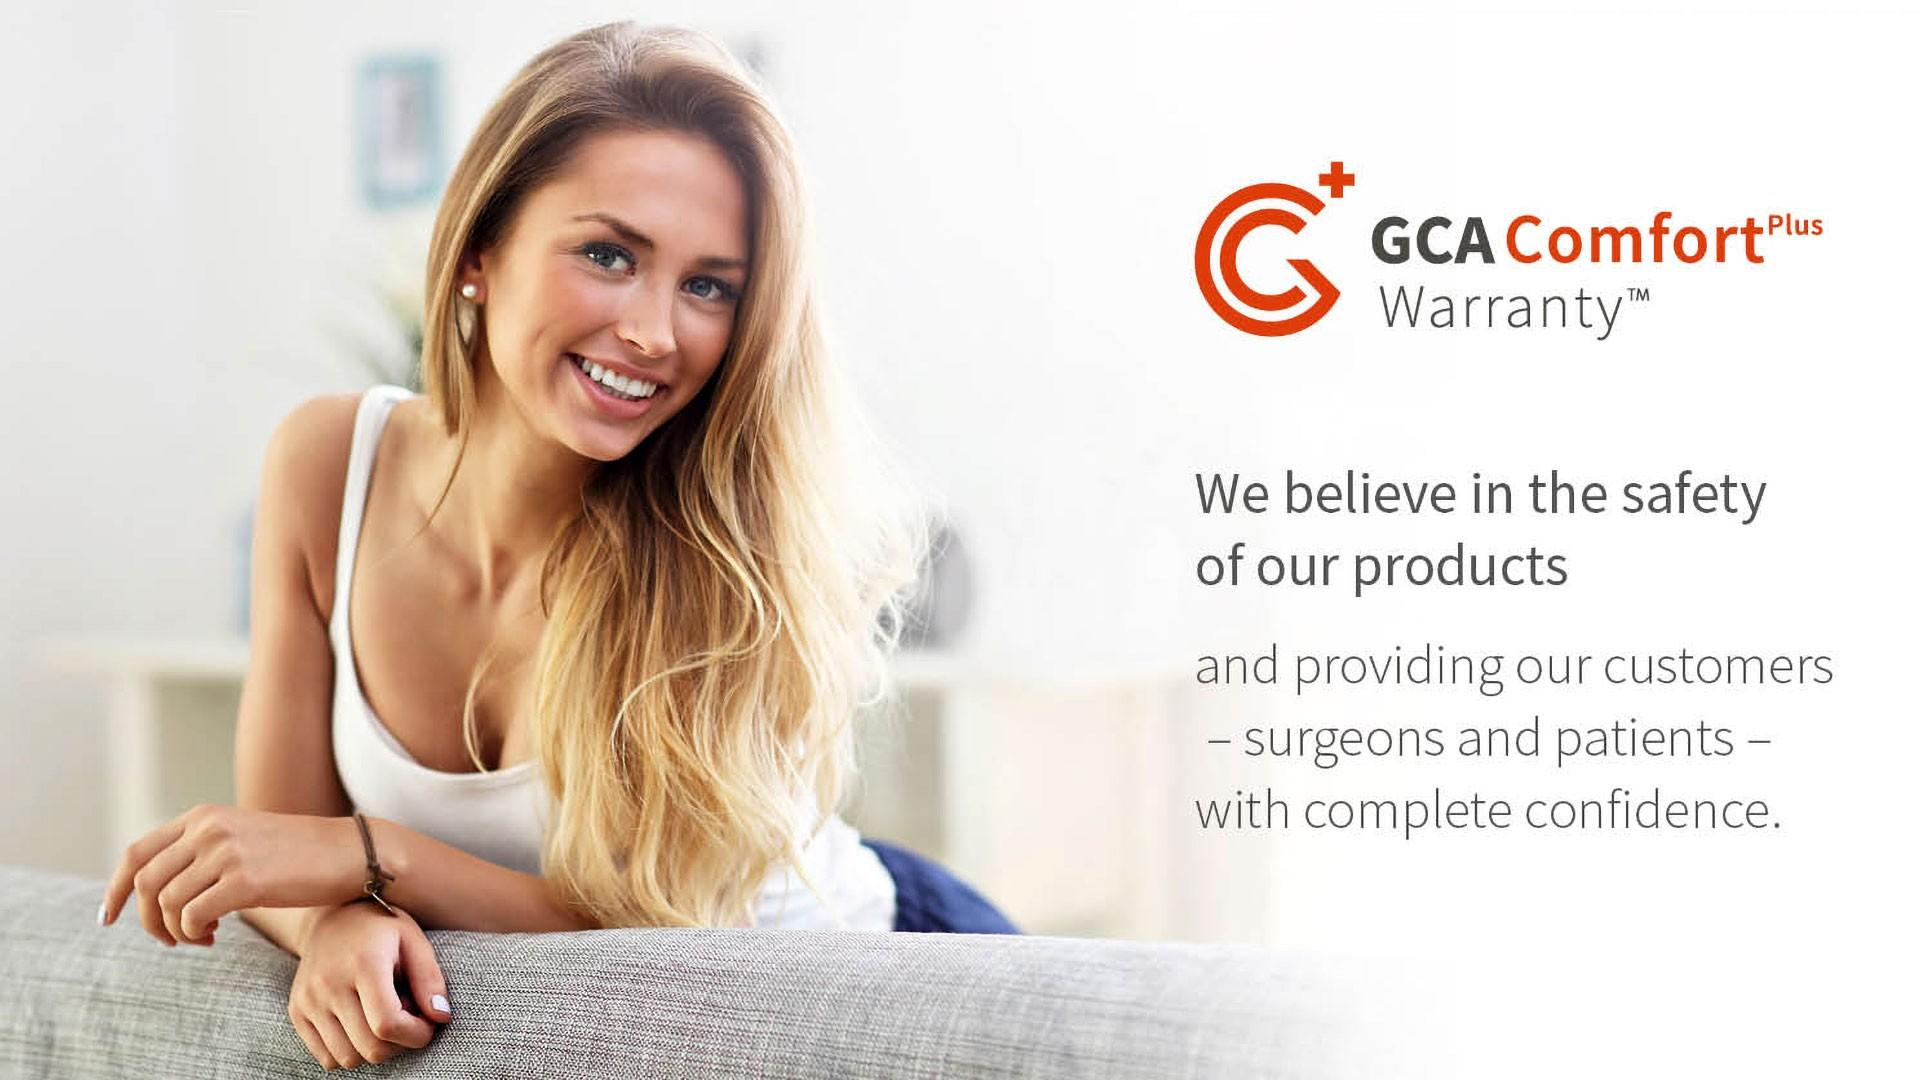 GC Aesthetics Comfort.